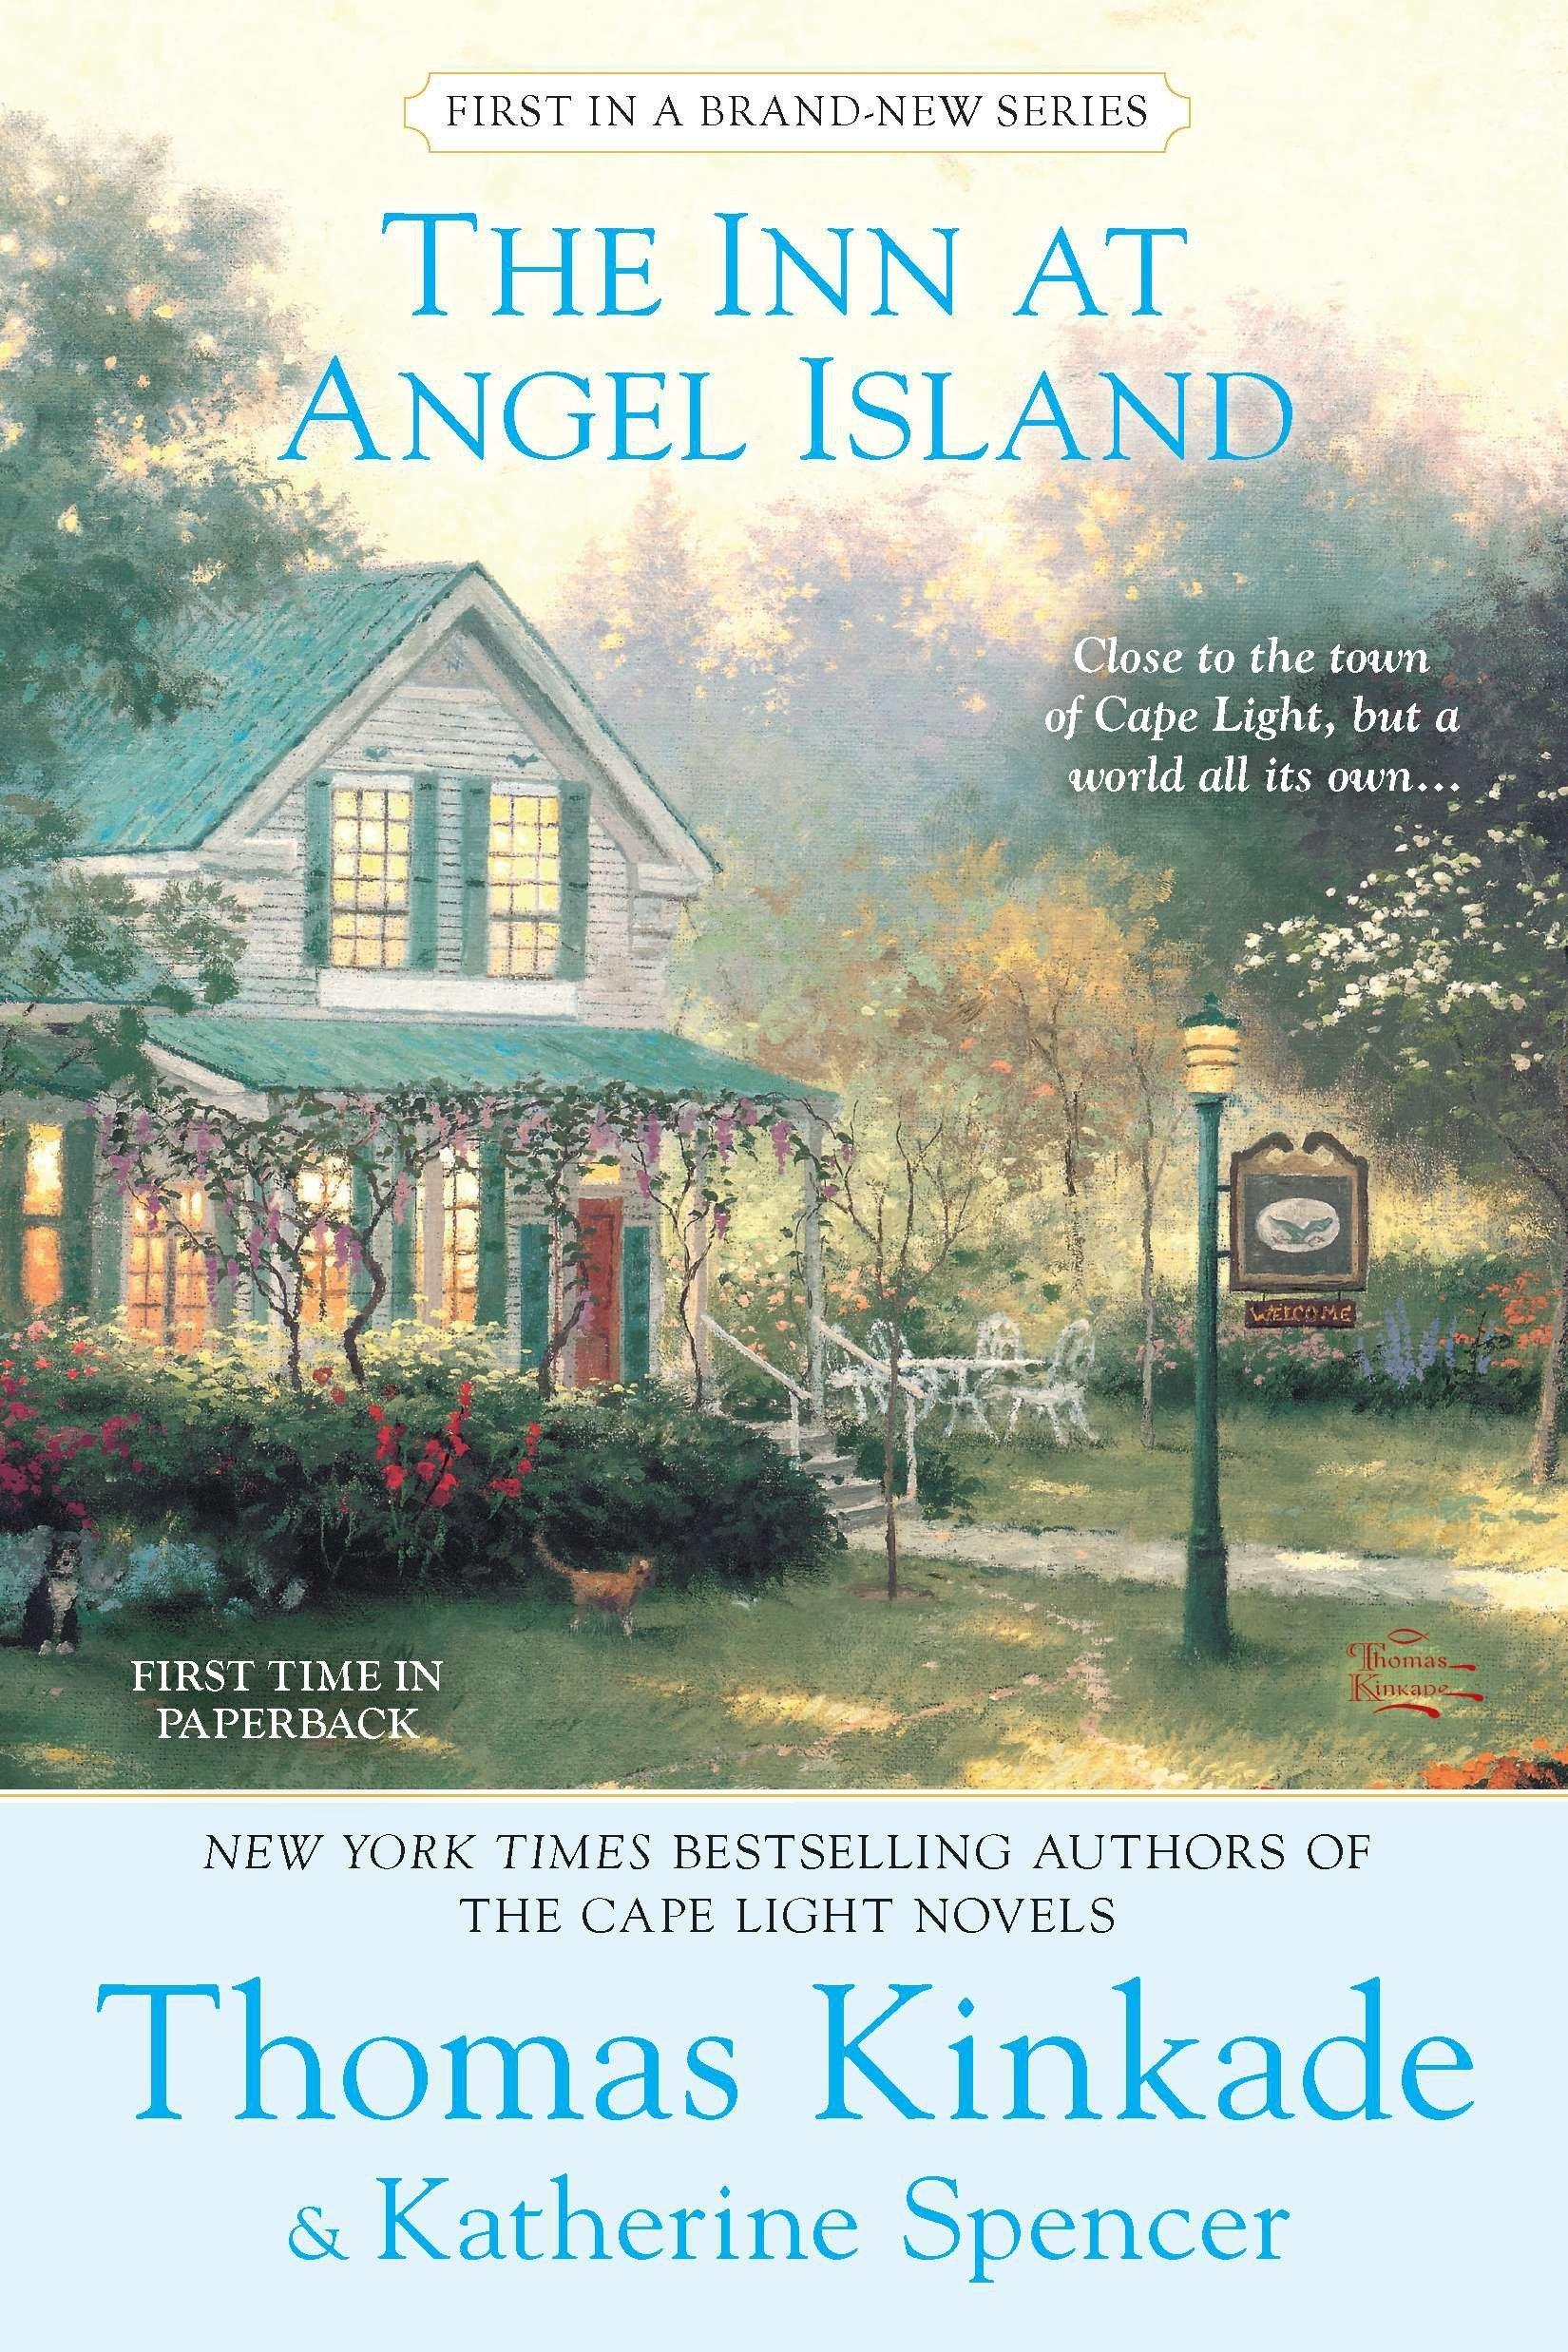 Download The Inn at Angel Island: An Angel Island Novel ebook